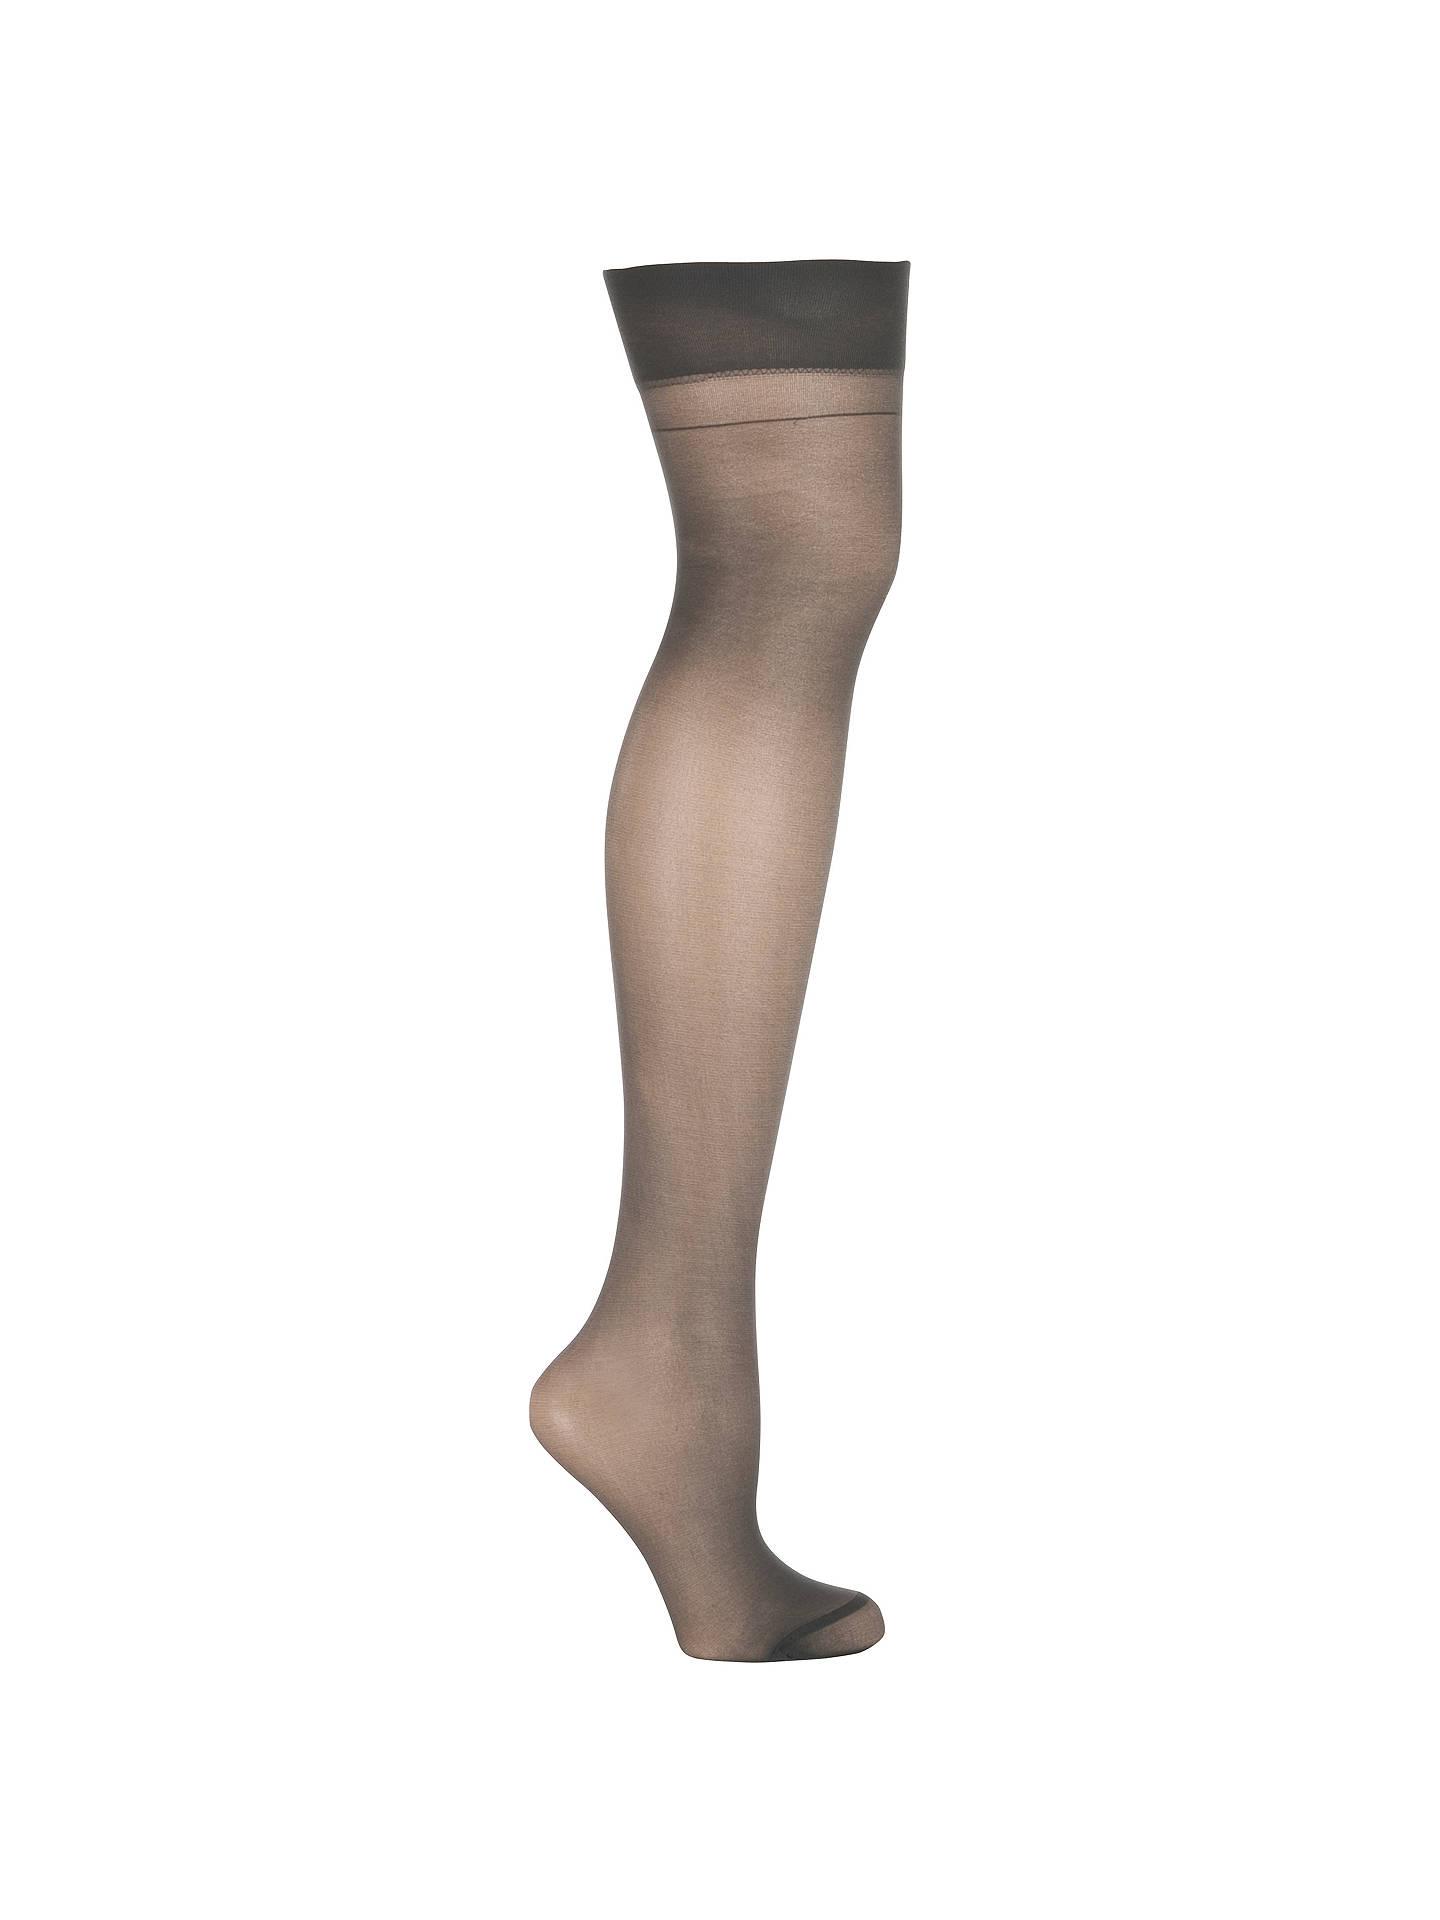 4d65a9b01b1 ... Buy John Lewis   Partners 15 Denier Sheer Stockings